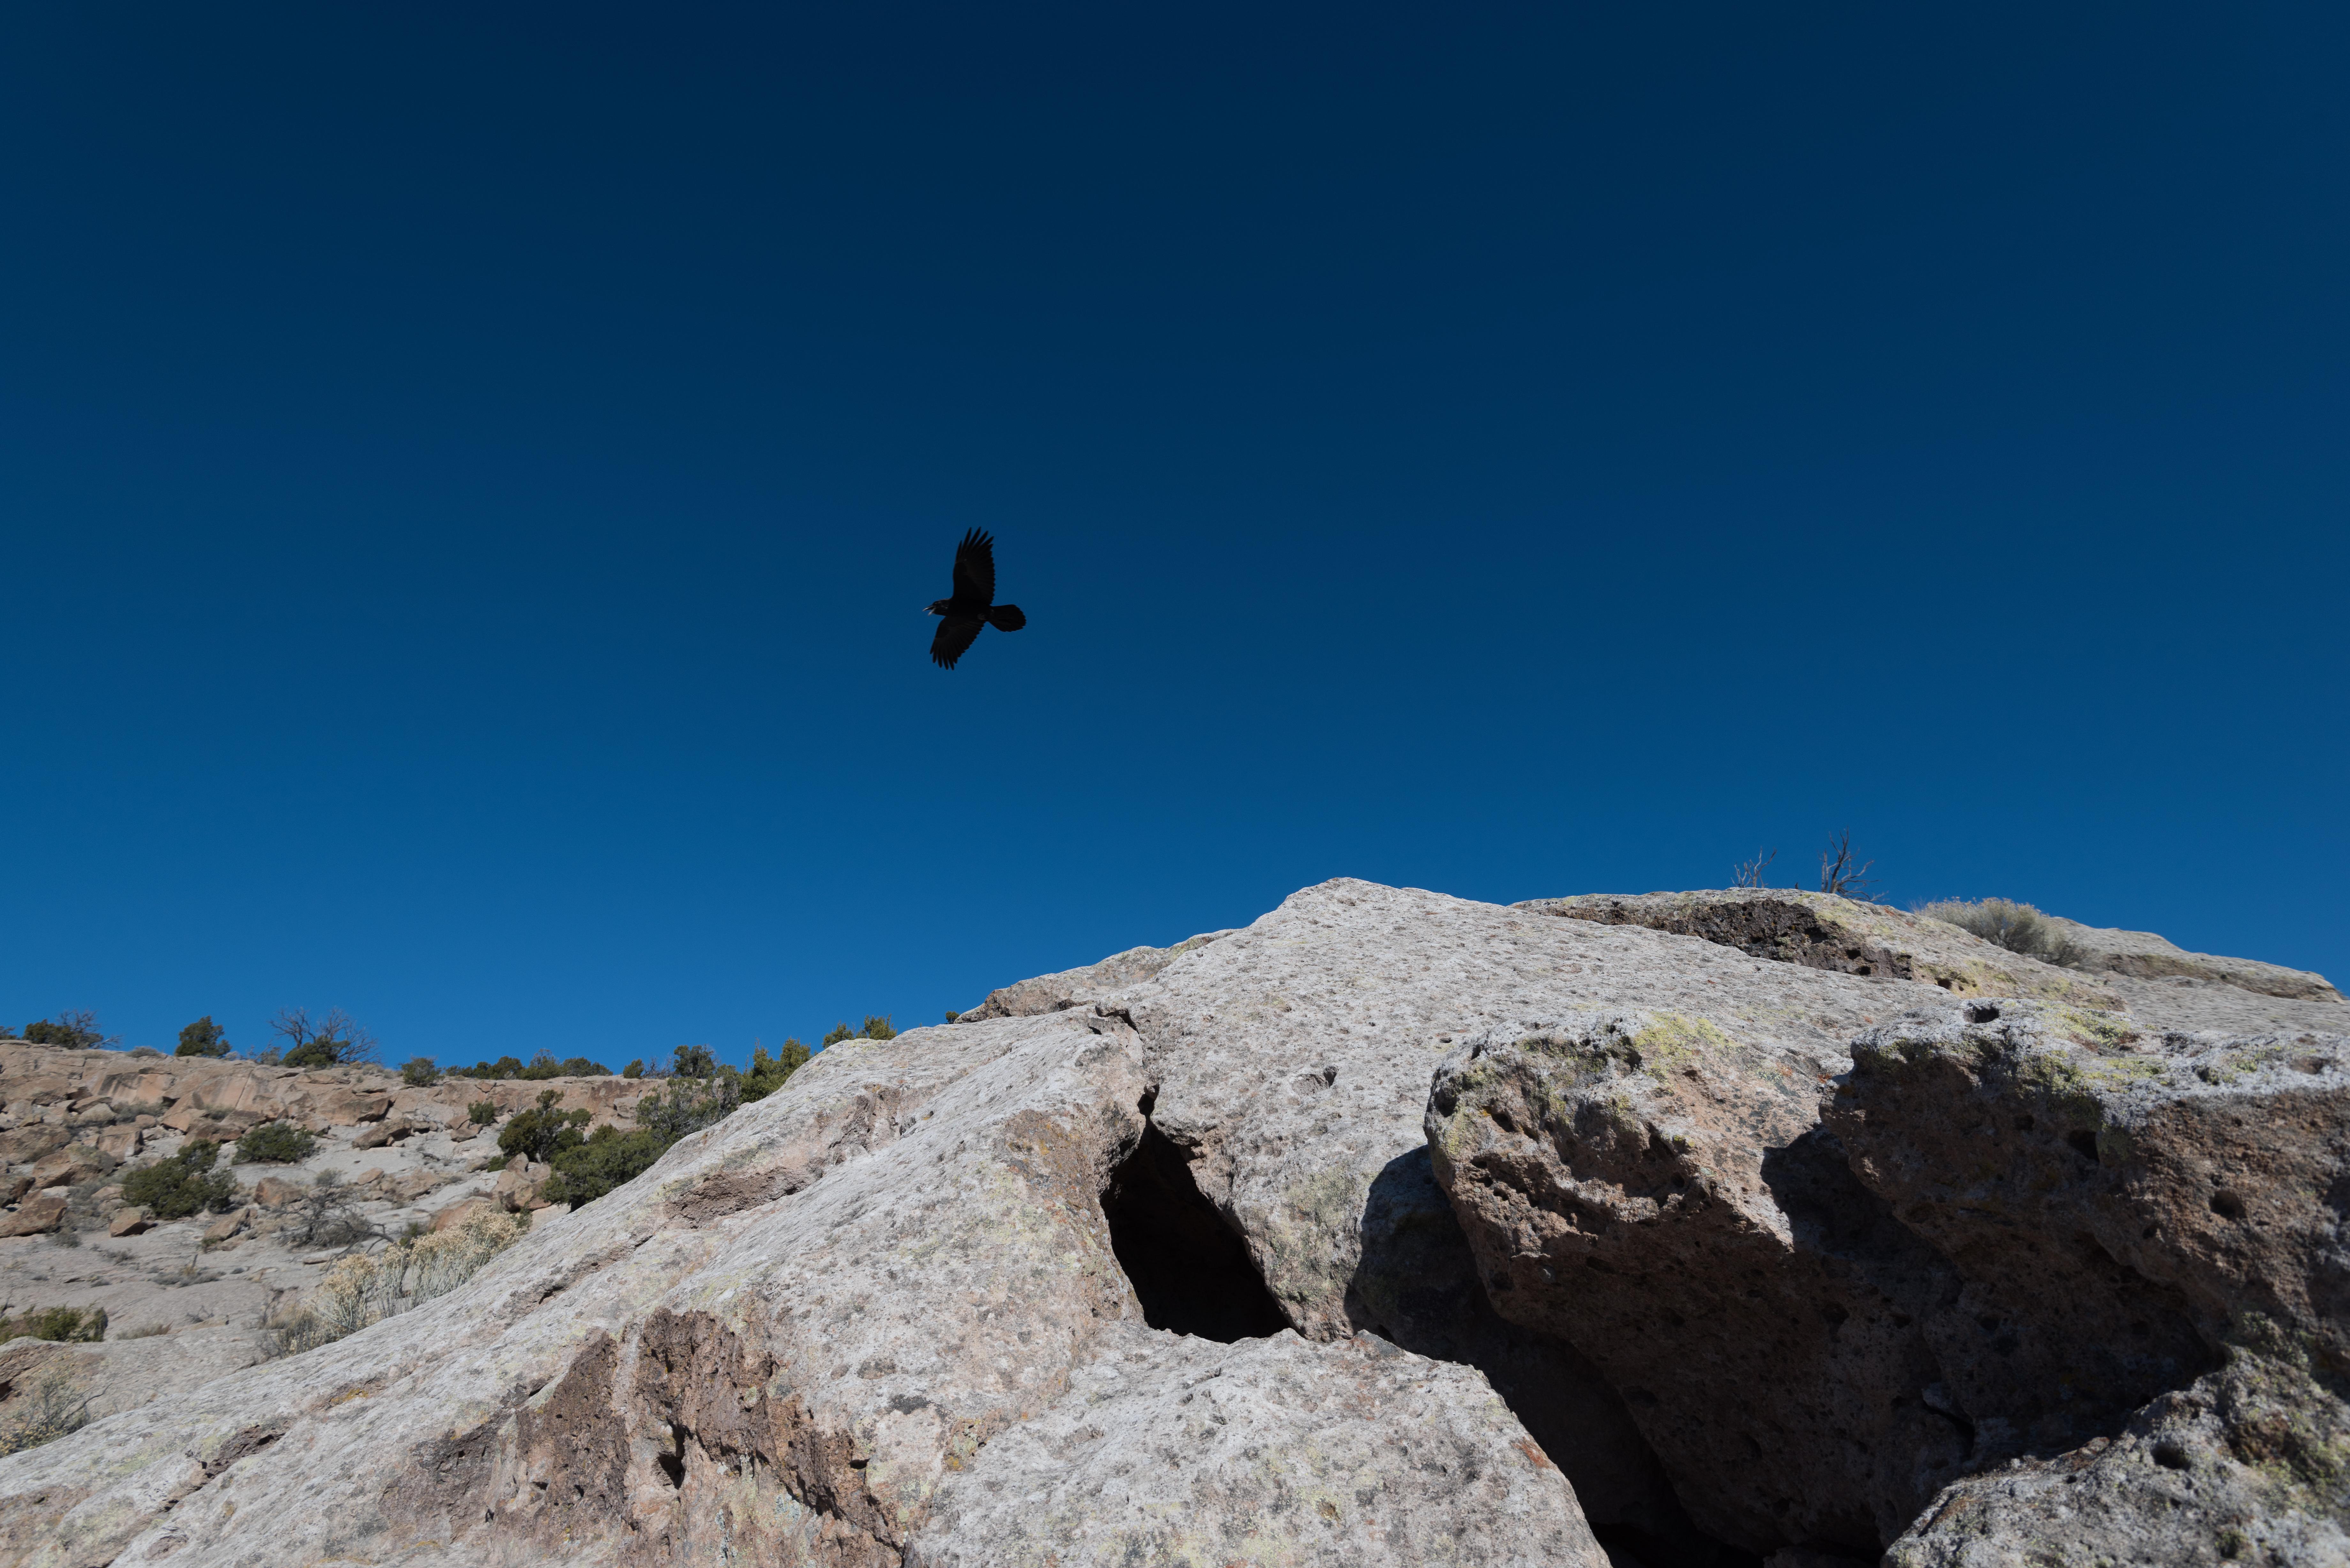 Eagle flies above NM canyon